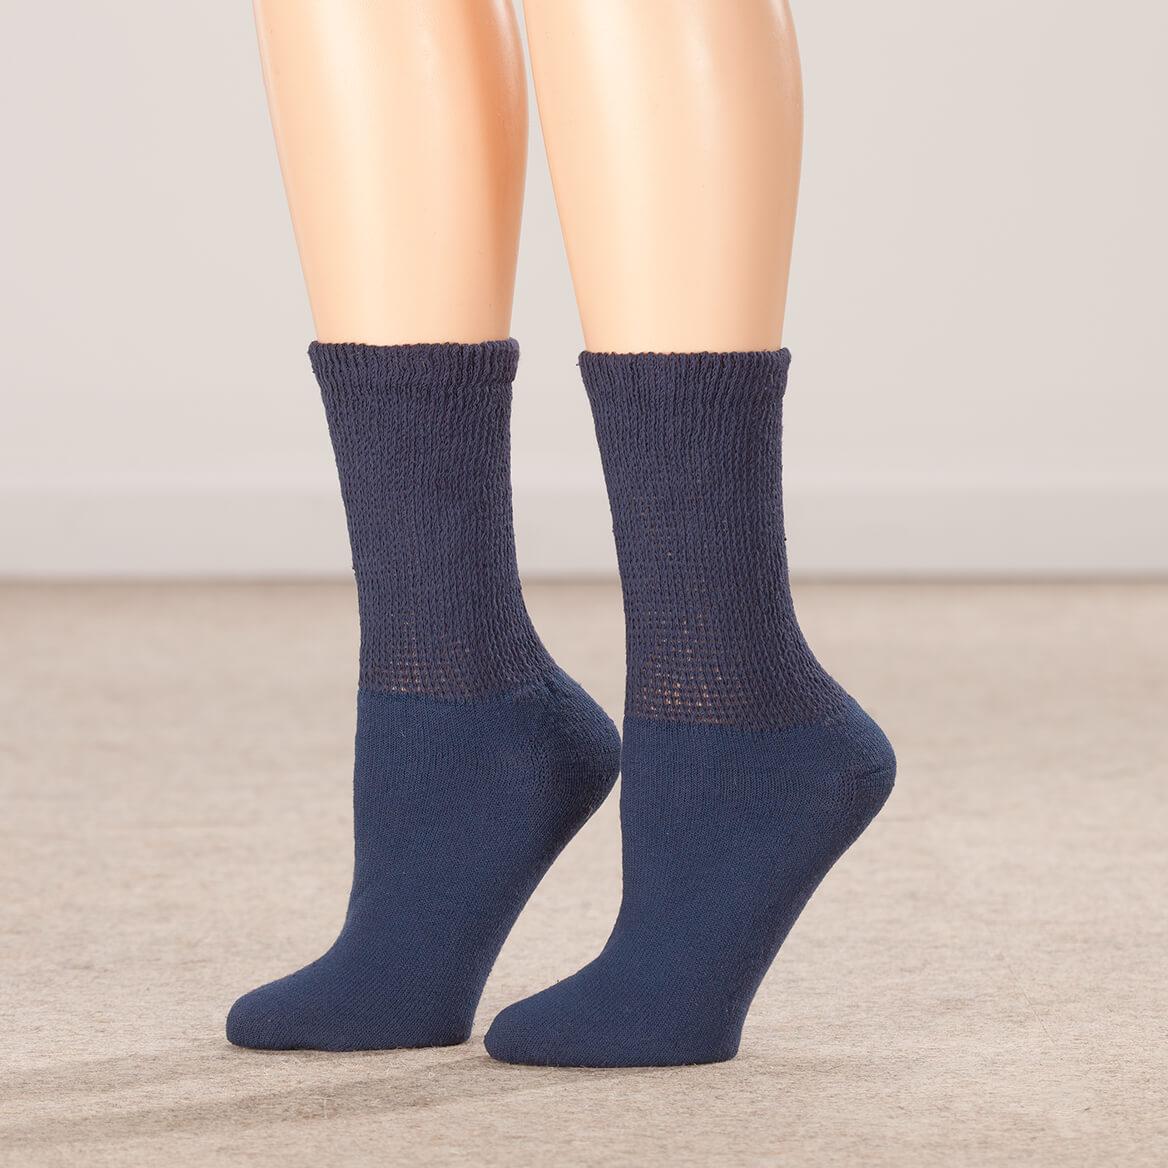 Silver Steps™ 3 Pack Diabetic Socks-351812